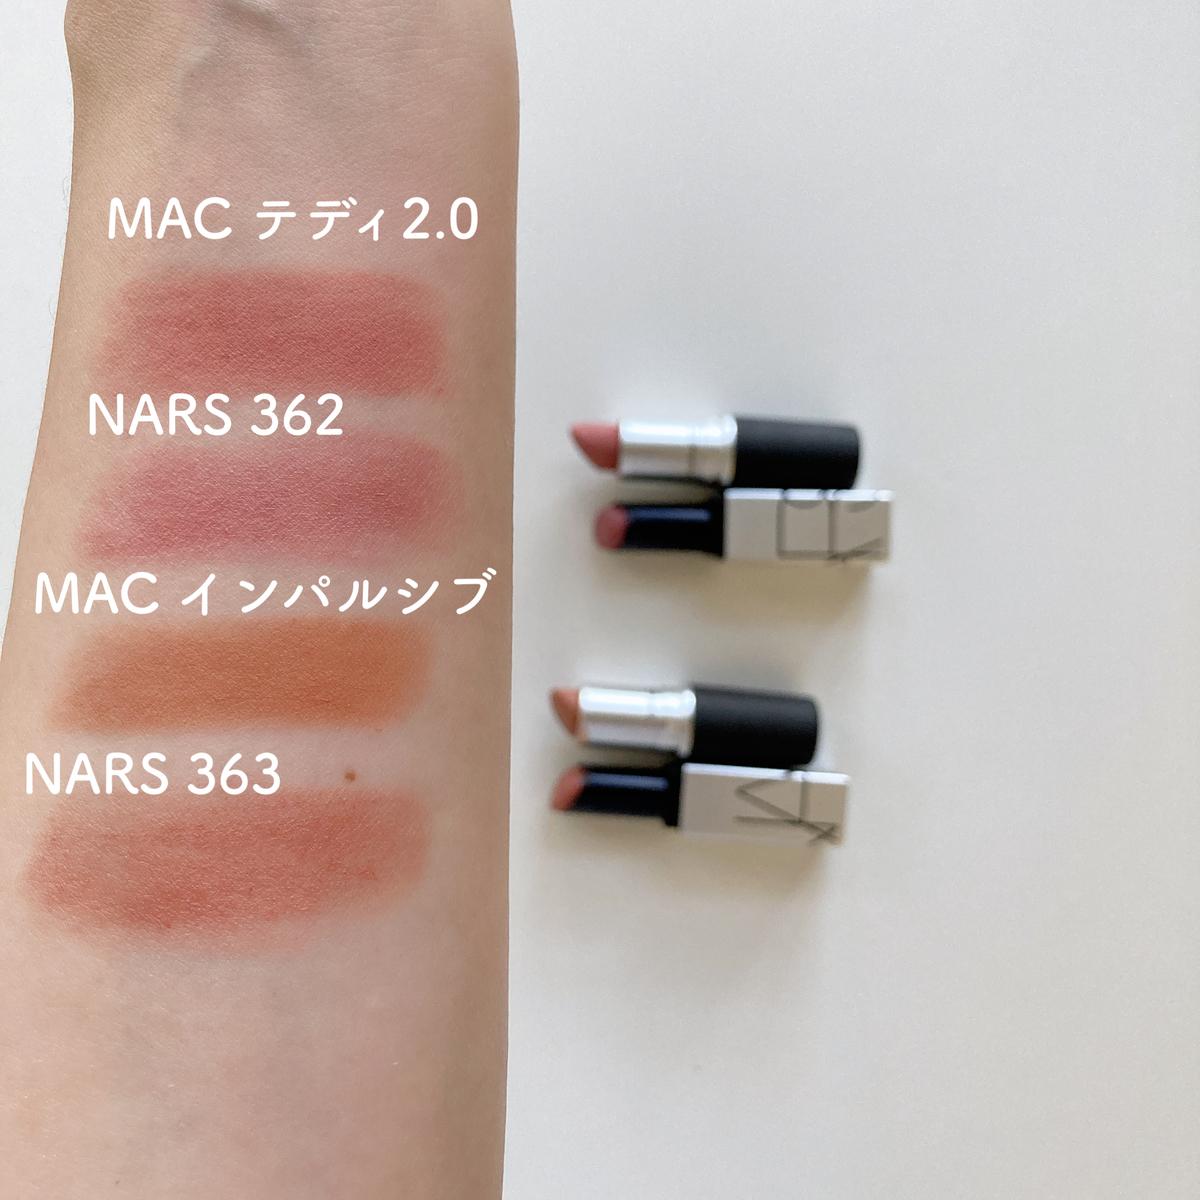 NARS ソフトマットティンティッドリップバーム362 363